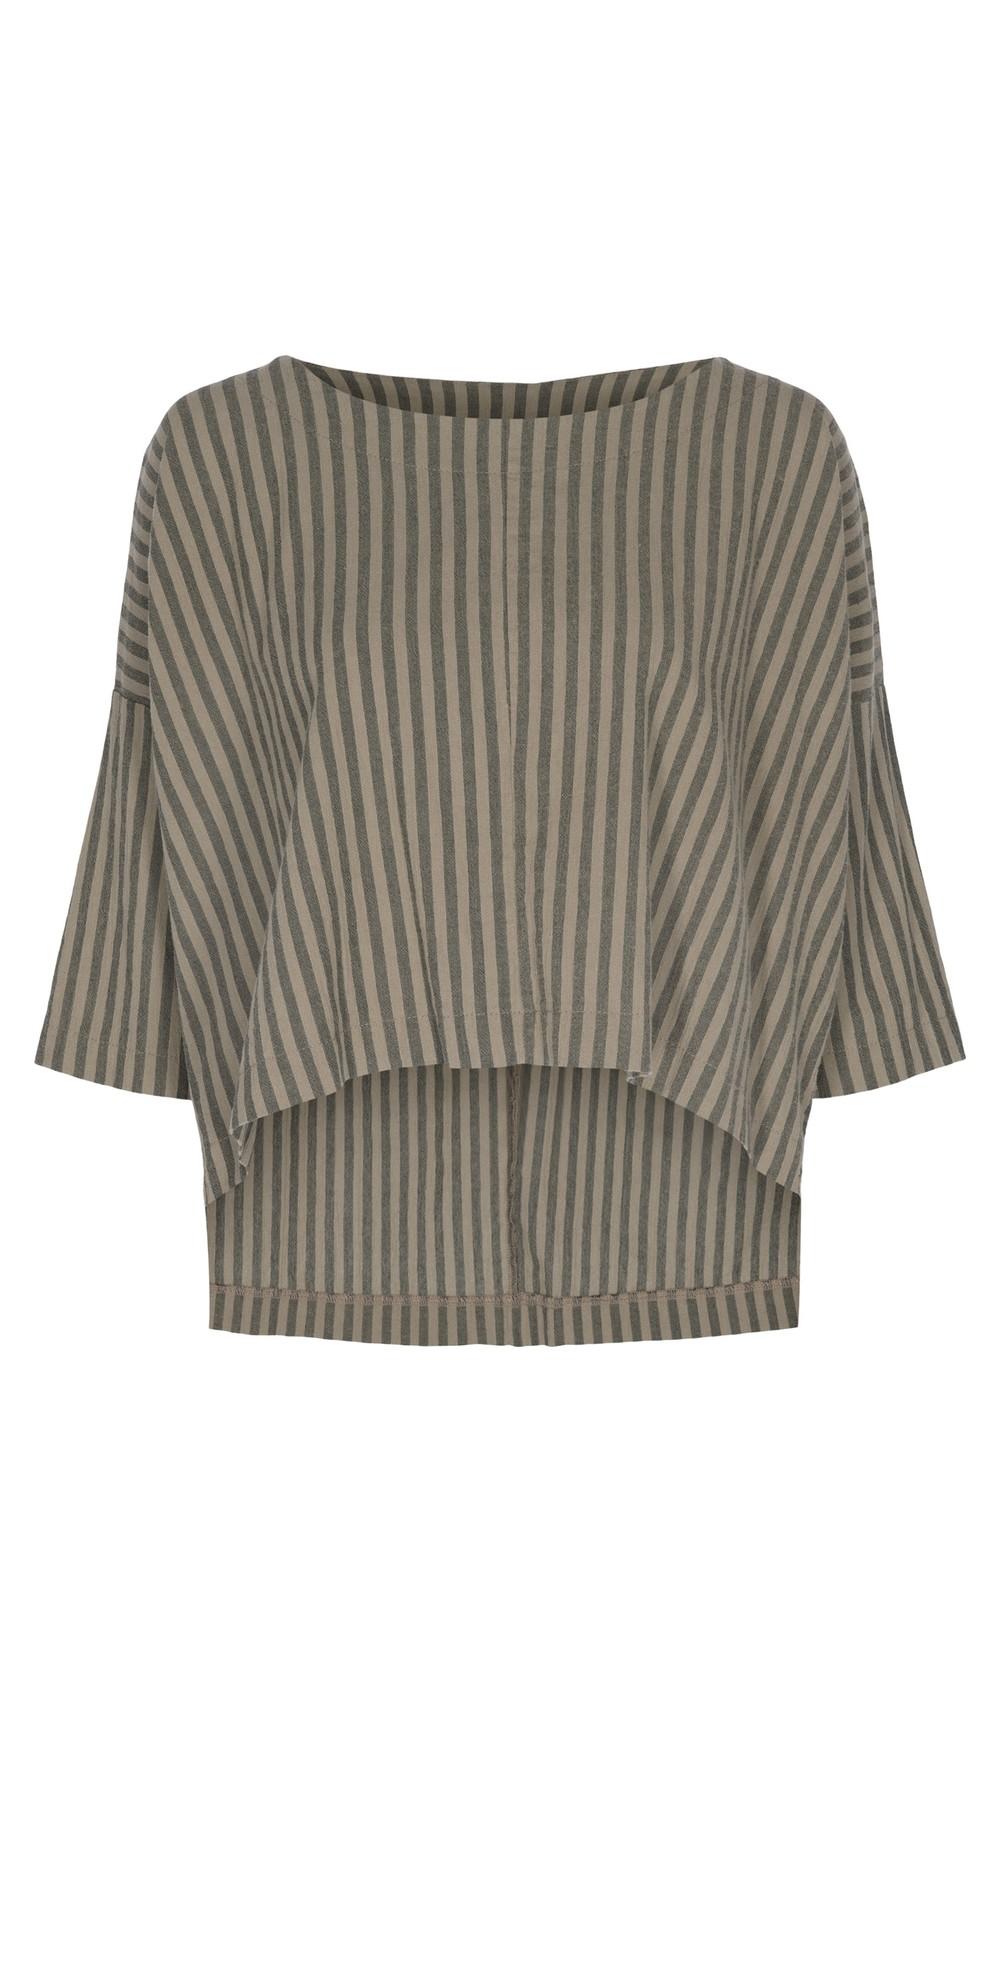 Reba Cotton Stripe Top main image